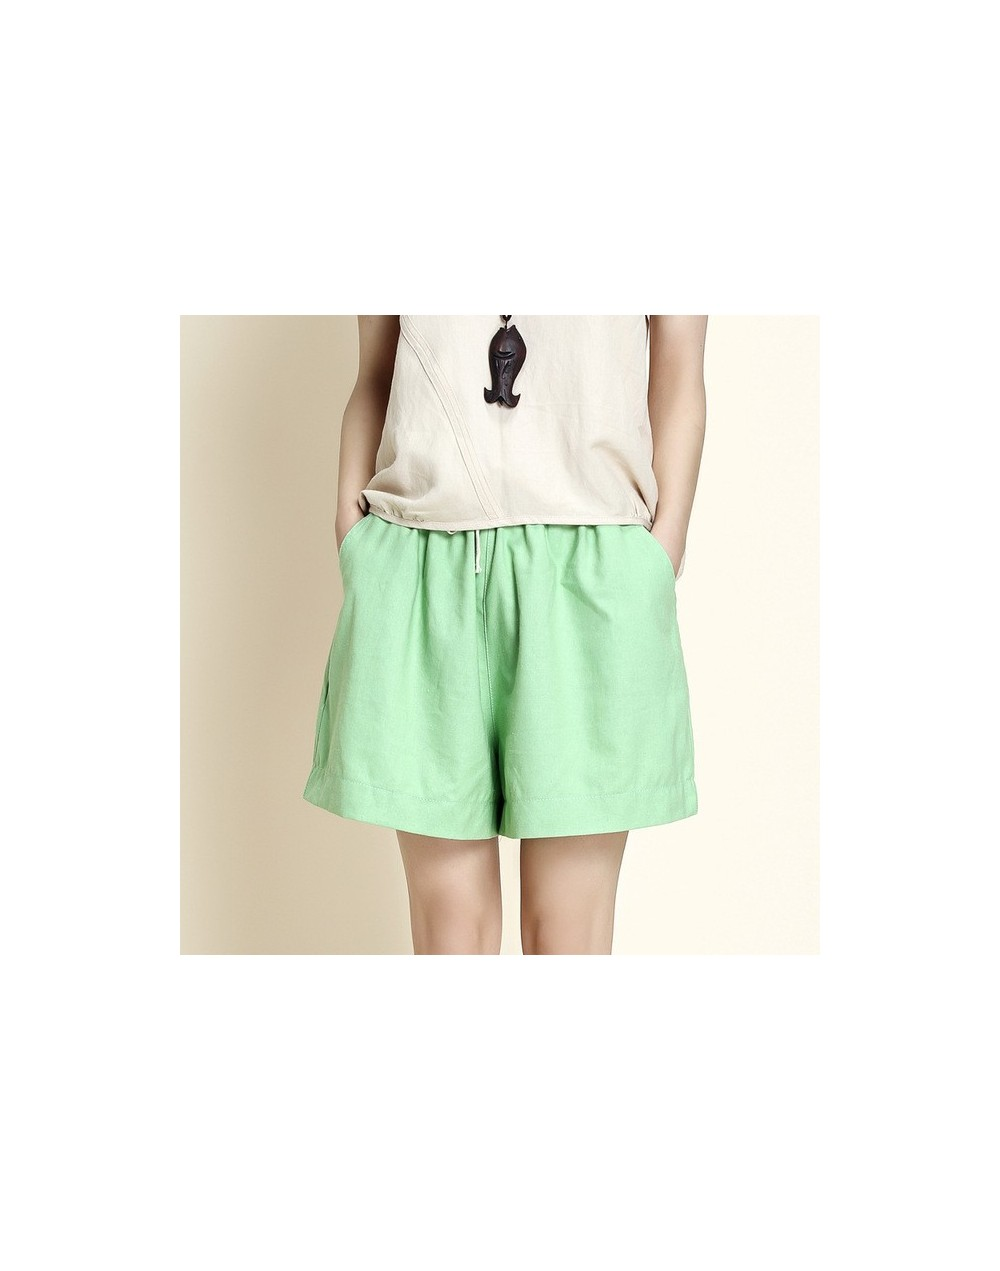 Brand Summer Women Cotton Linen Shorts Leisure Loose Short Pants Elastic Waist Casual Fashion Candy Color Big Plus Size - gr...